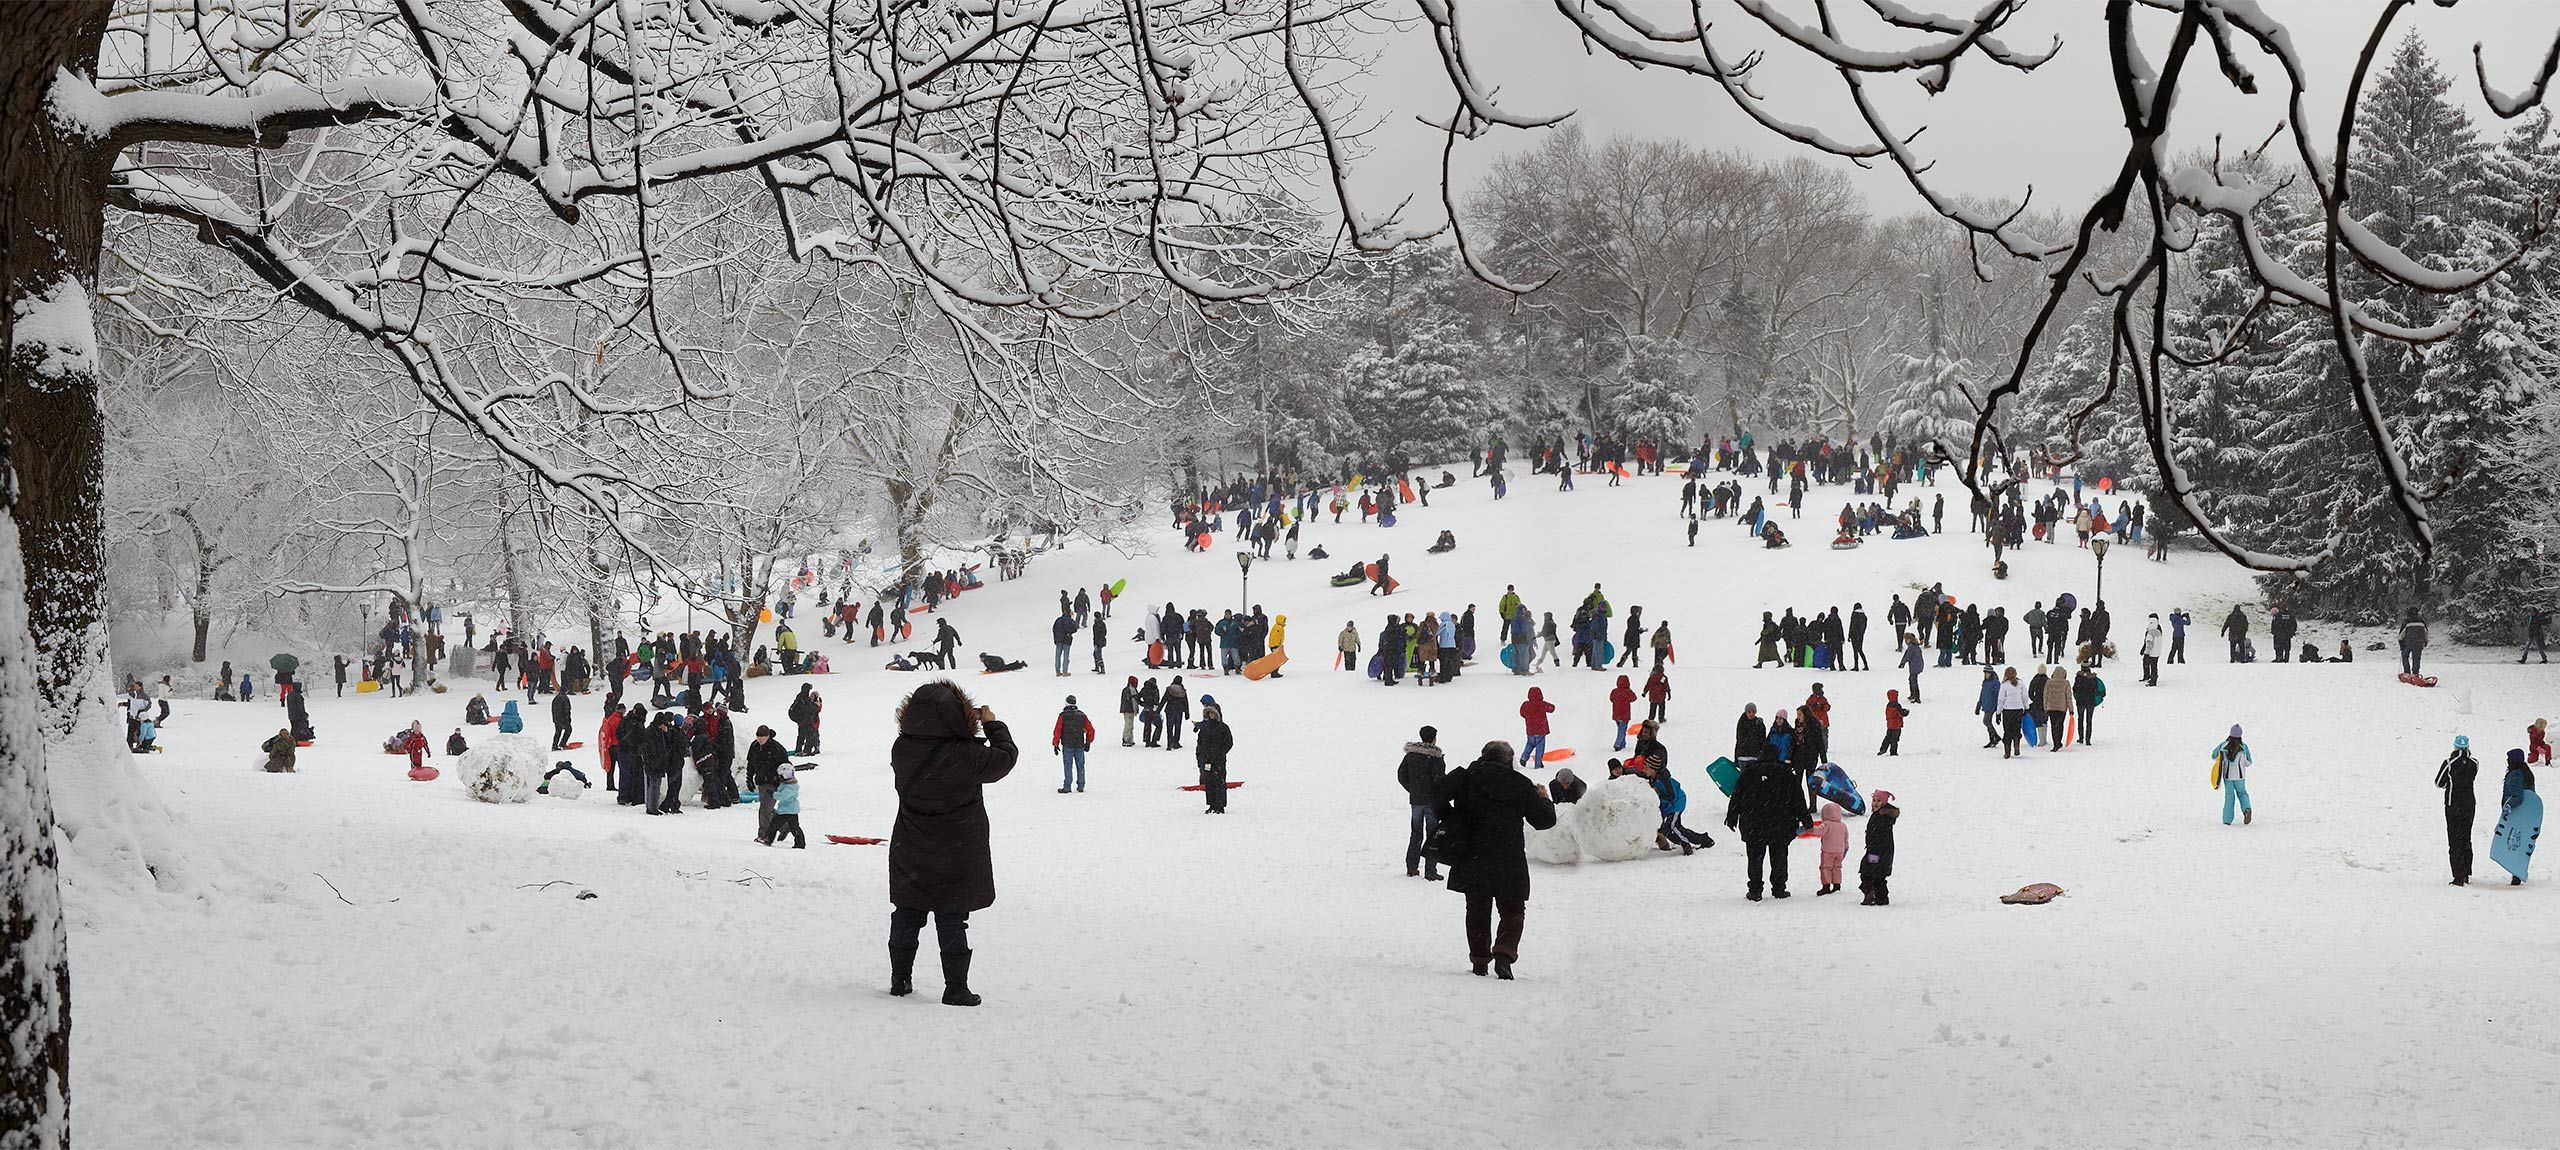 NY-Snow-Central-Park-02_10-248.jpg